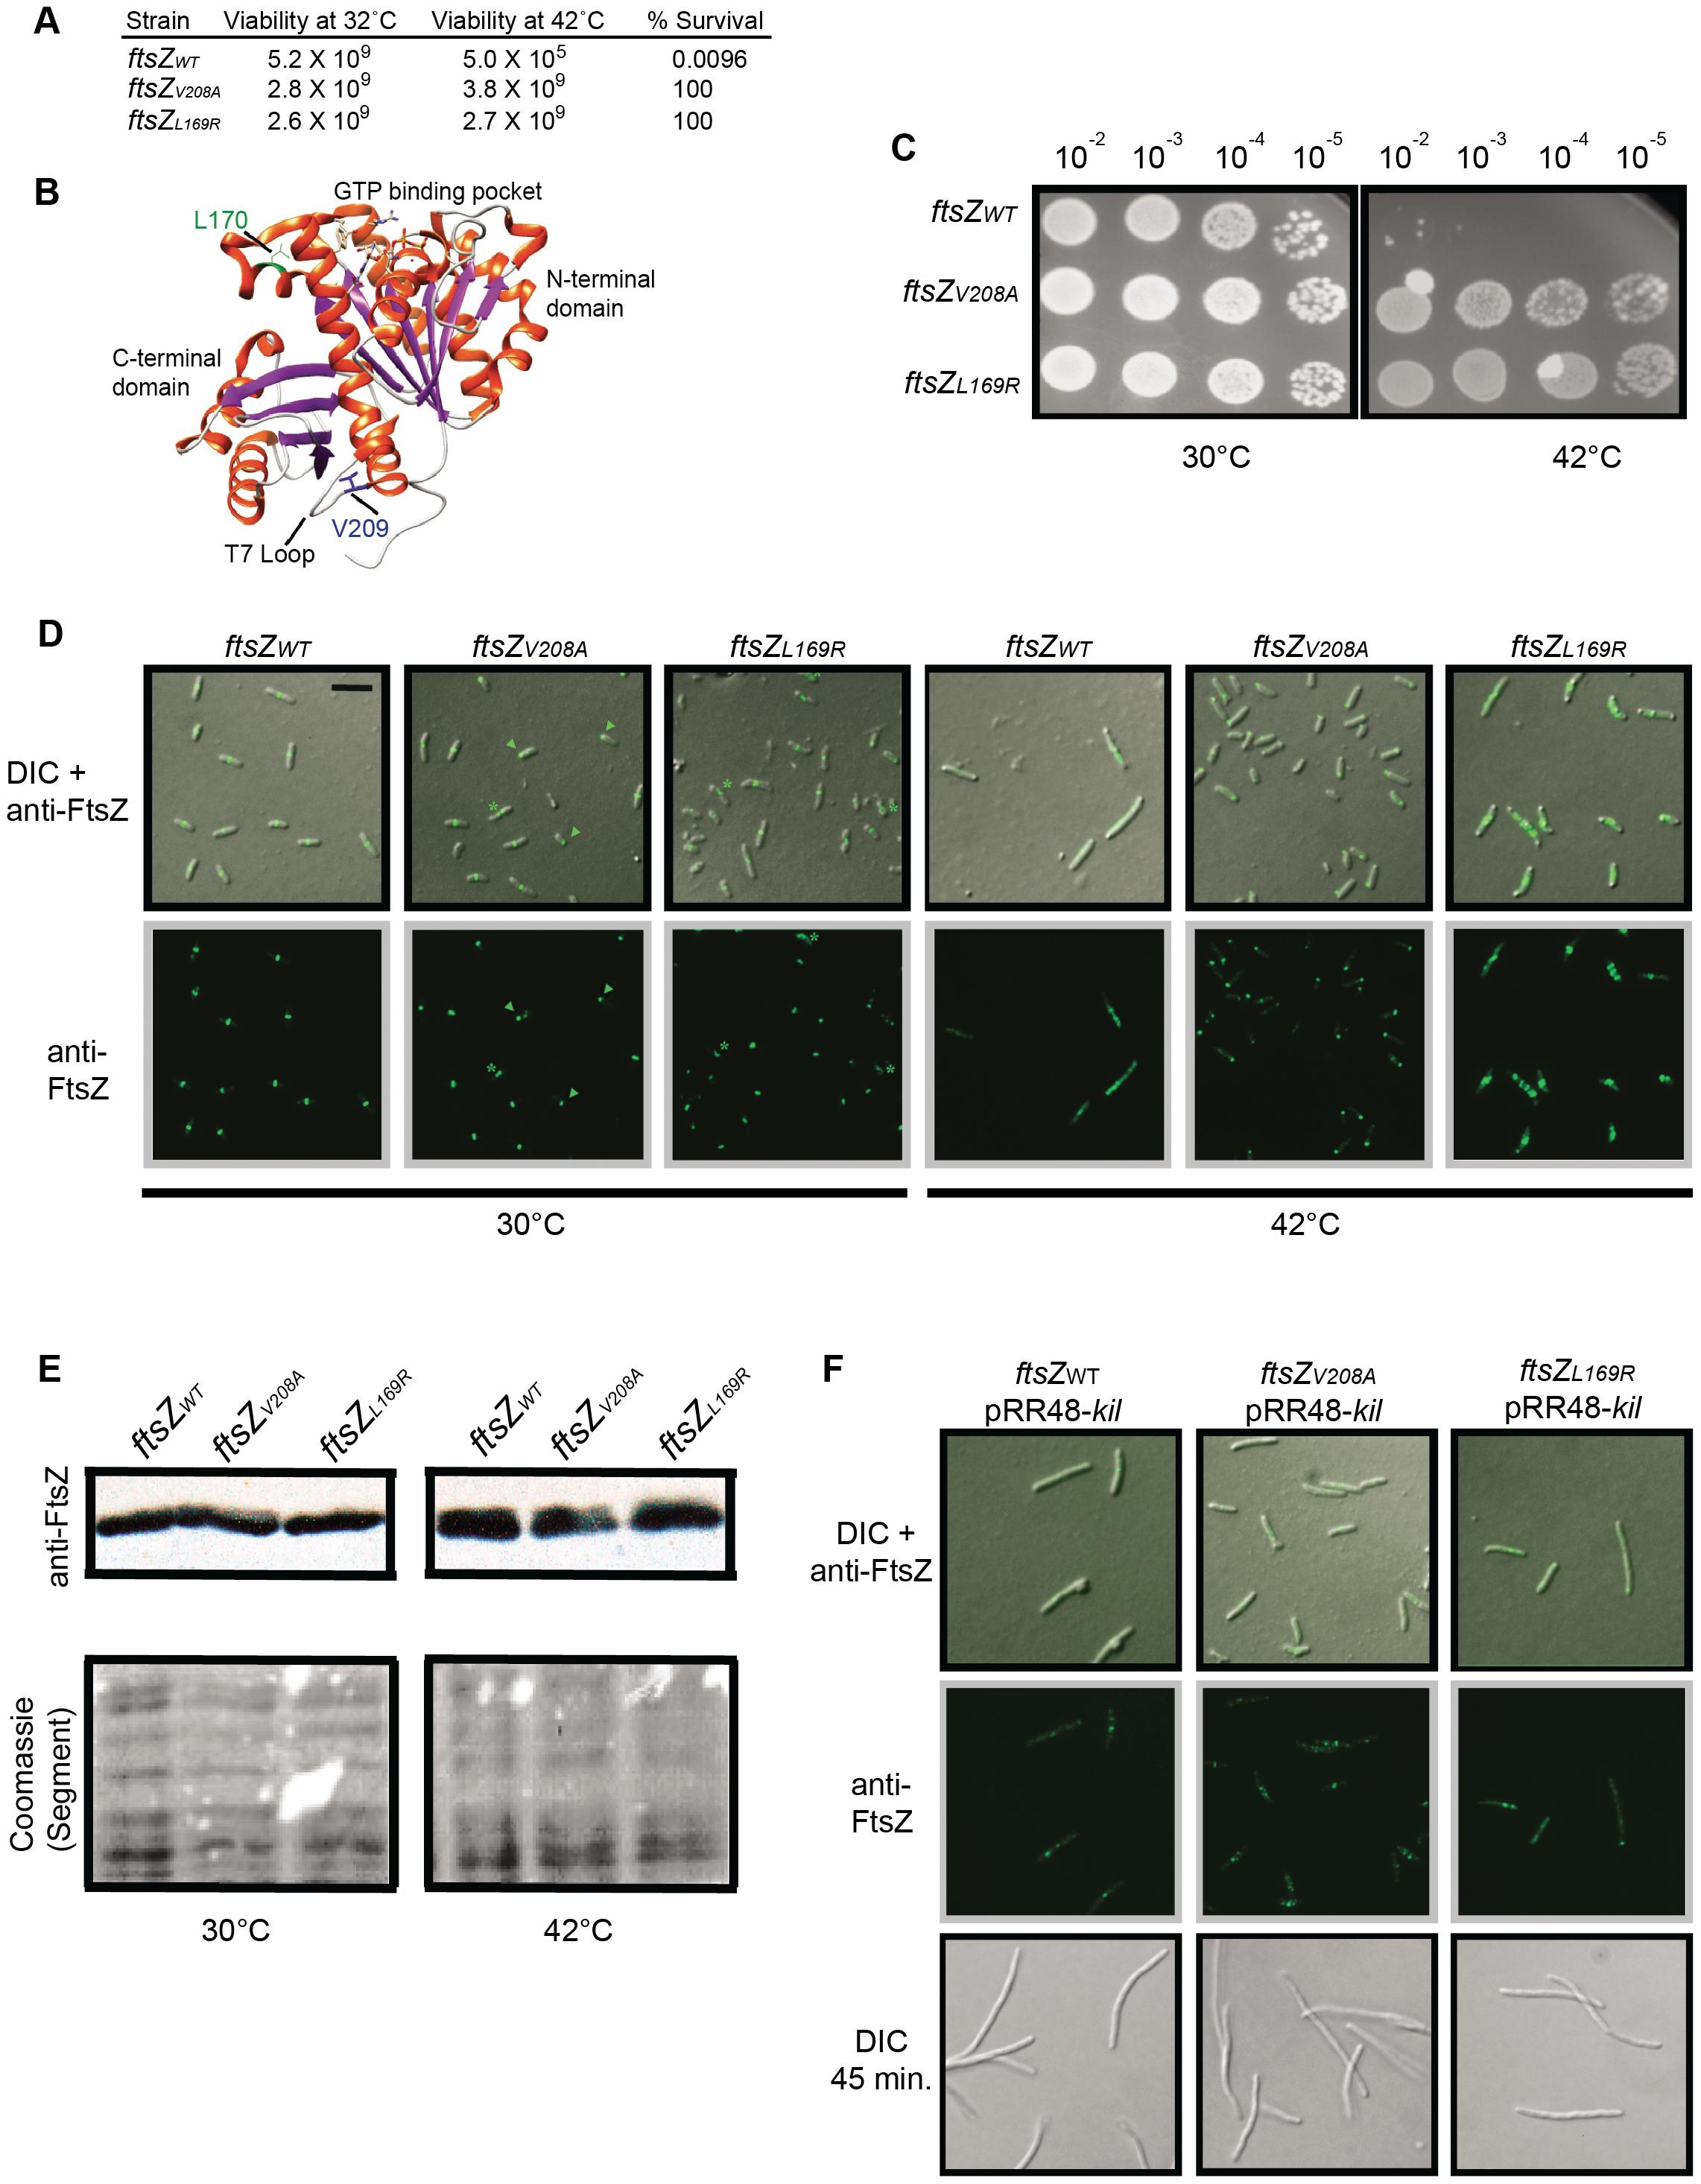 Characterization of Kil-resistant <i>ftsZ</i> alleles.